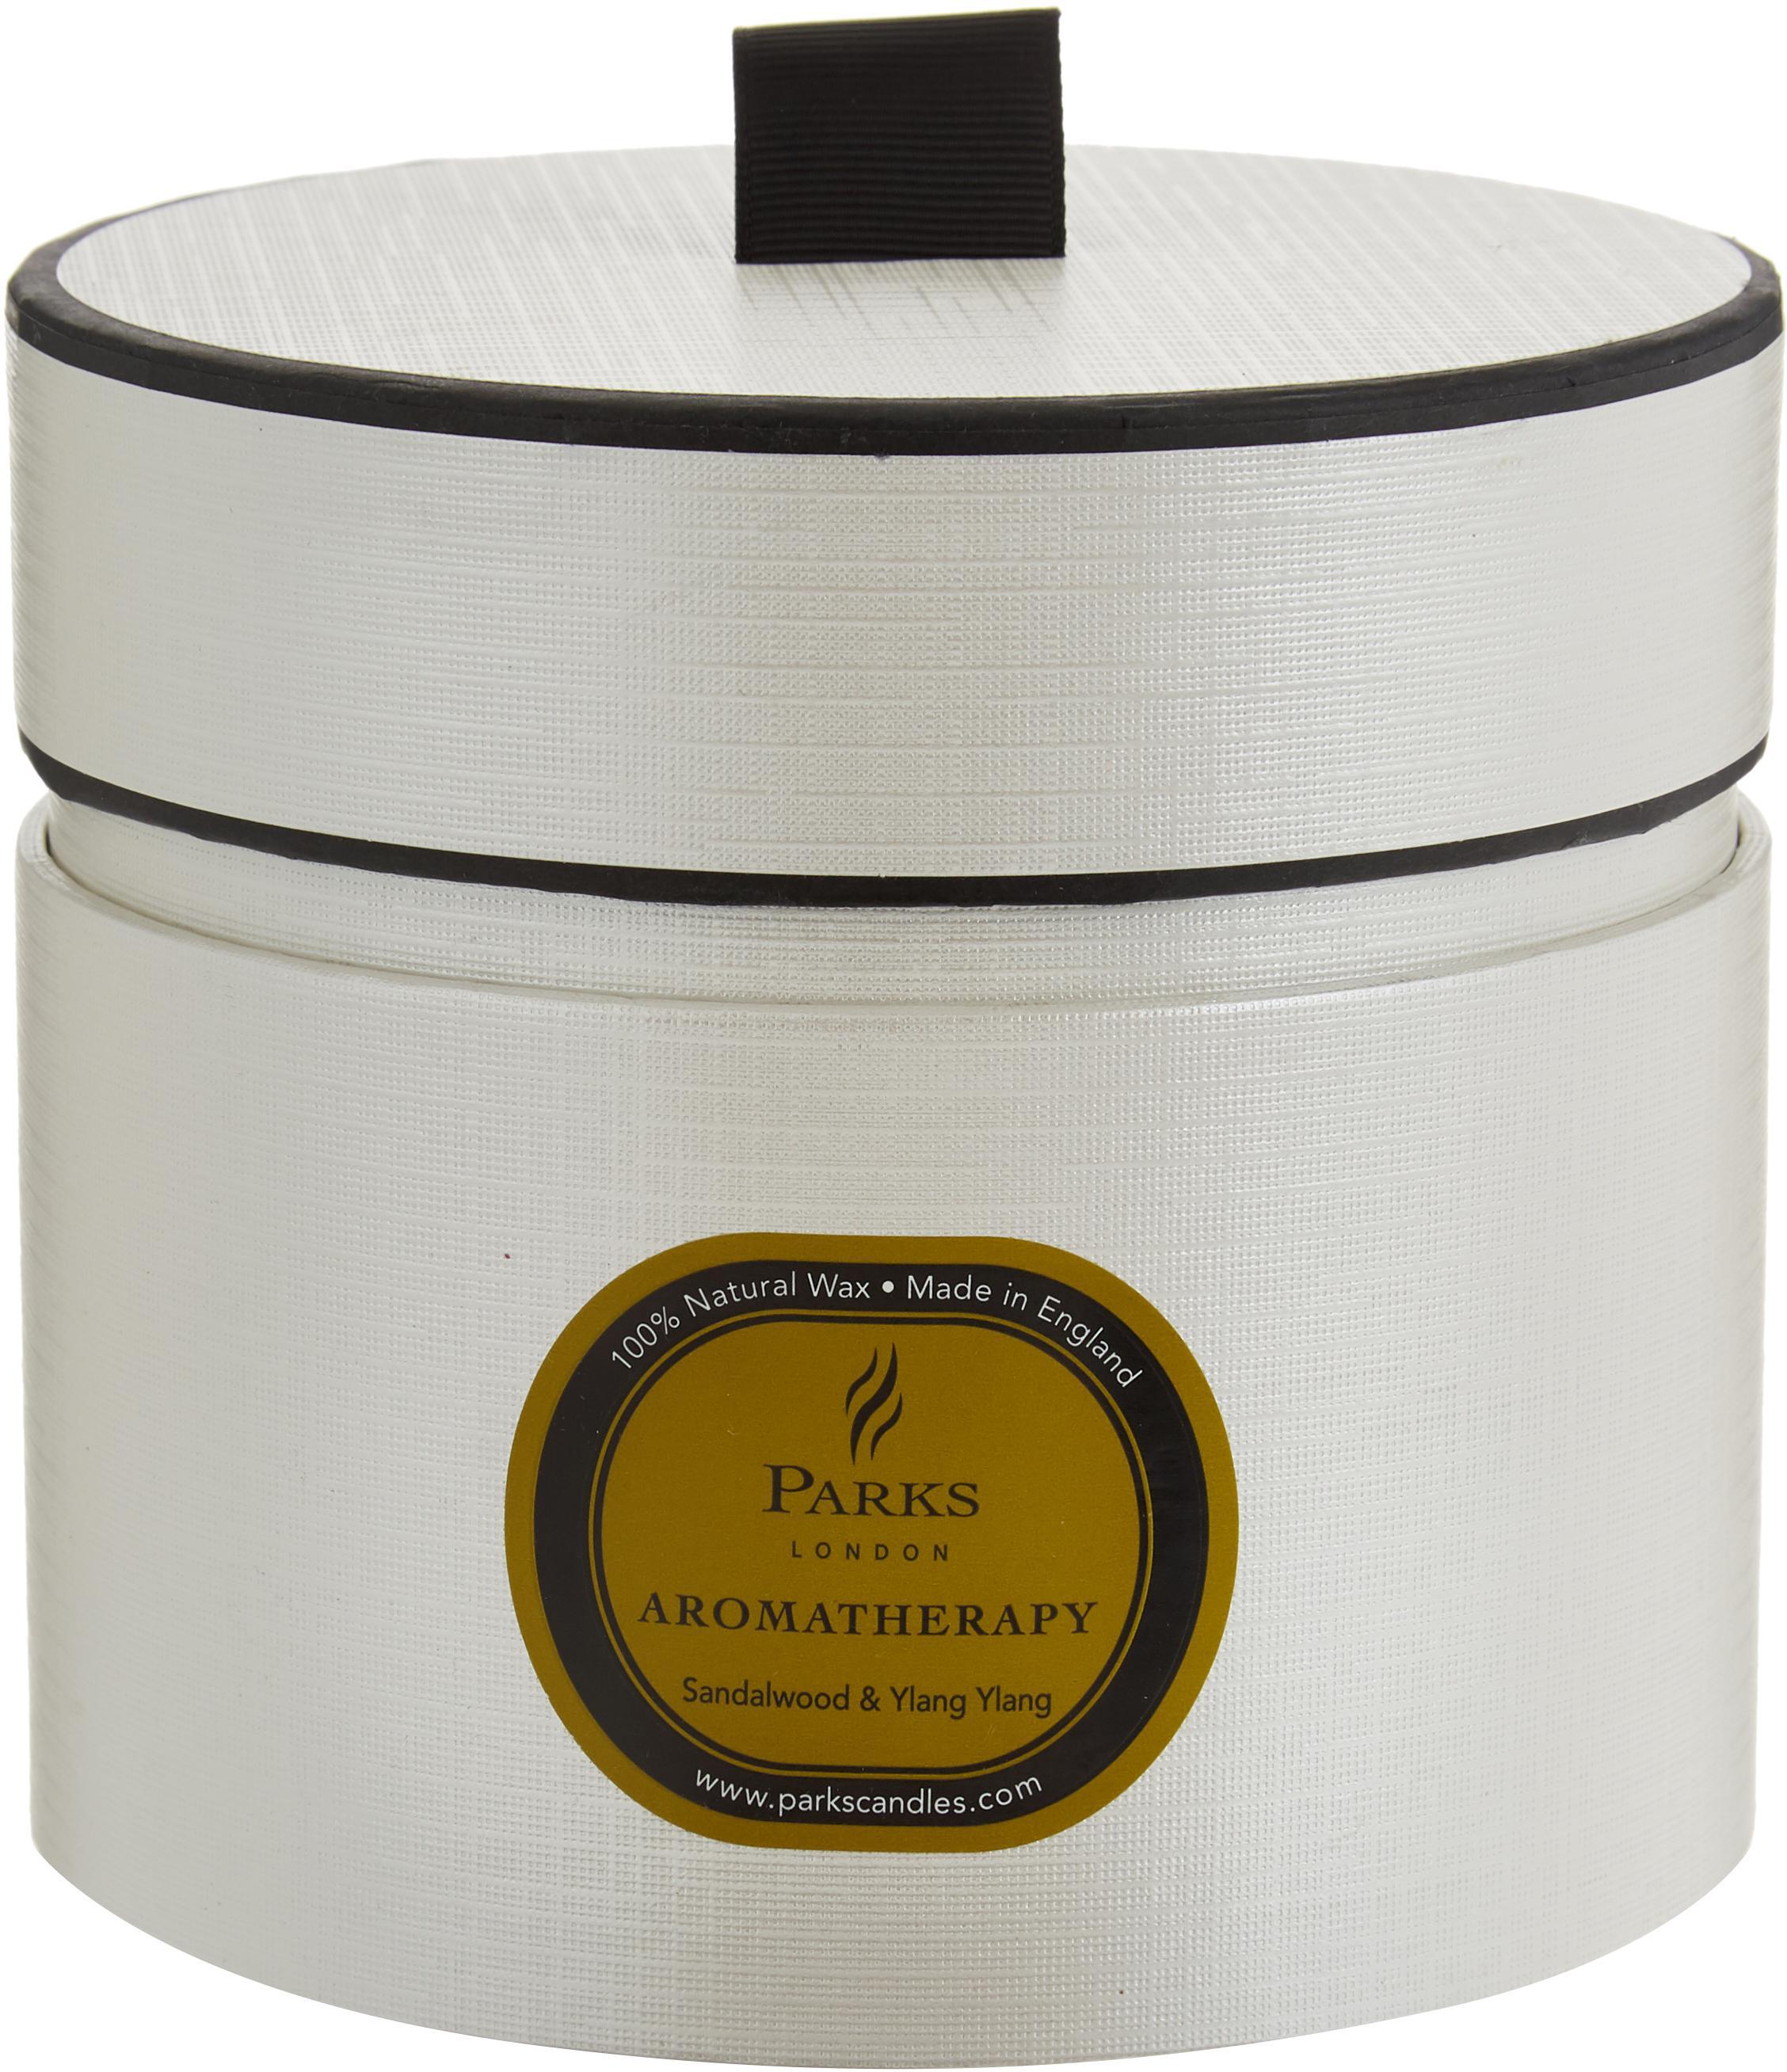 Dreidochtduftkerze Aromatherapy (Sandelholz & Ylang Ylang), Behälter: Glas, Weiß, Grün, H 11 x Ø 12 cm